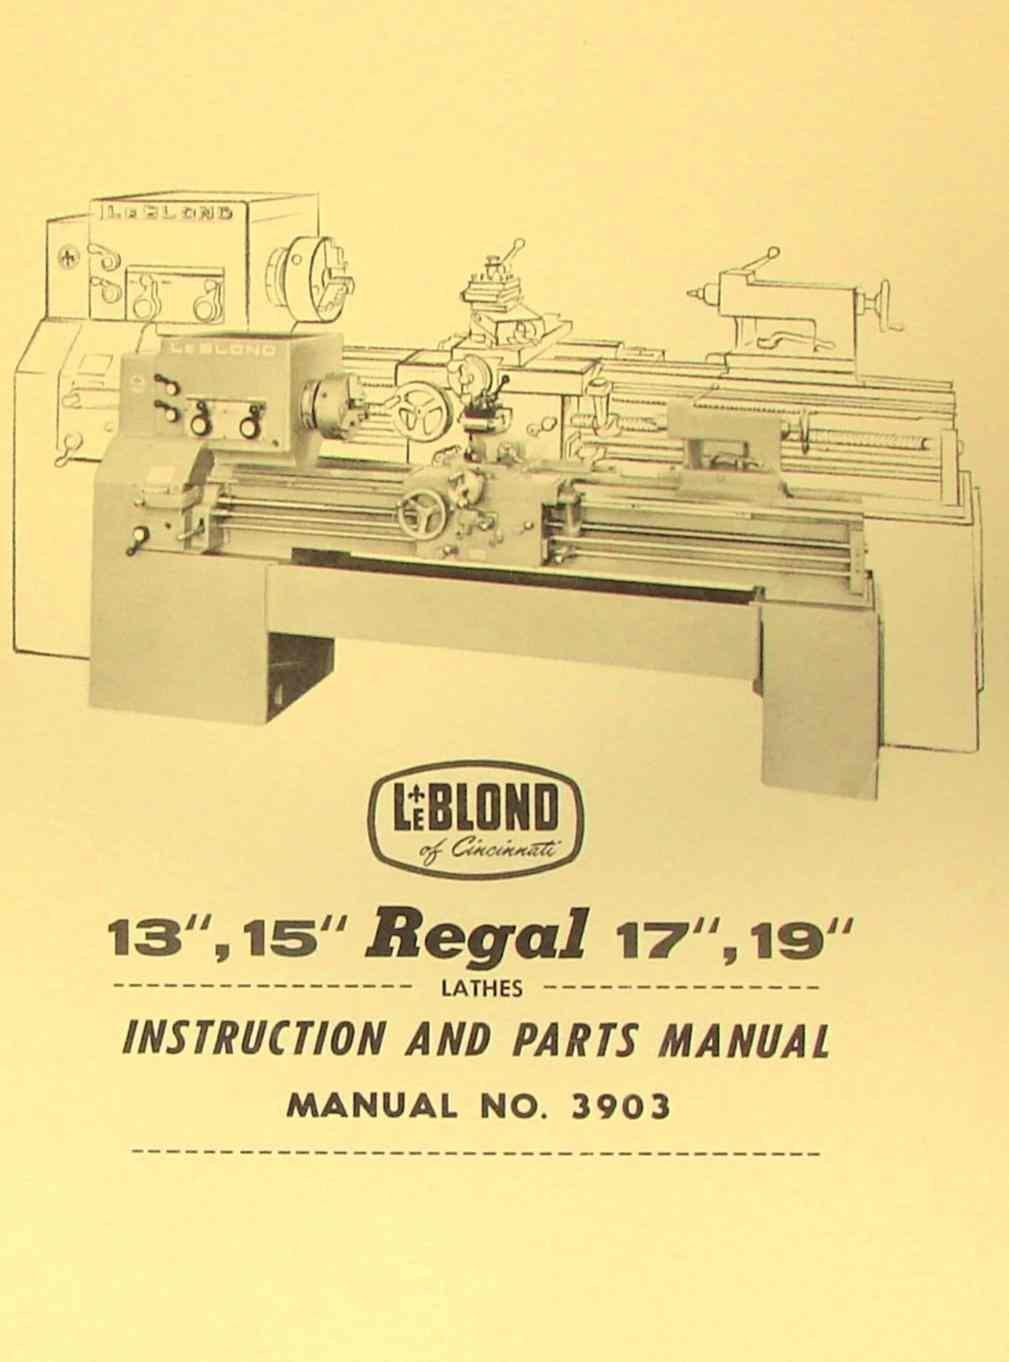 "LEBLOND REGAL 13"" 15"" 17"" 19"" Lathe Manual 3903: Misc.: Amazon.com: Books"